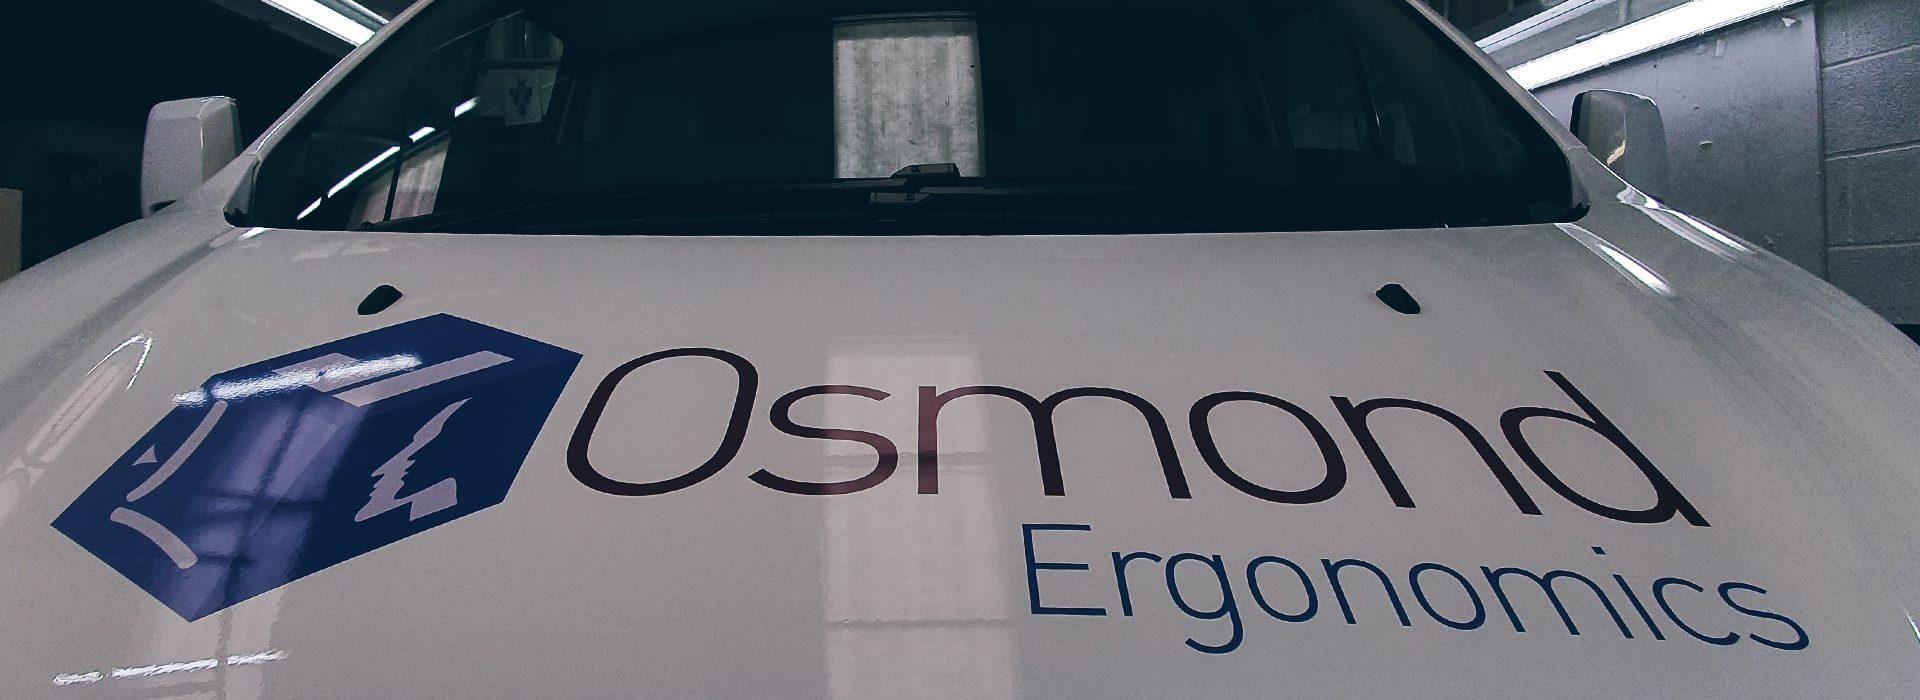 Portfolio - Osmond Ergonomics Van Wrap Bonnet - Insignia Signs